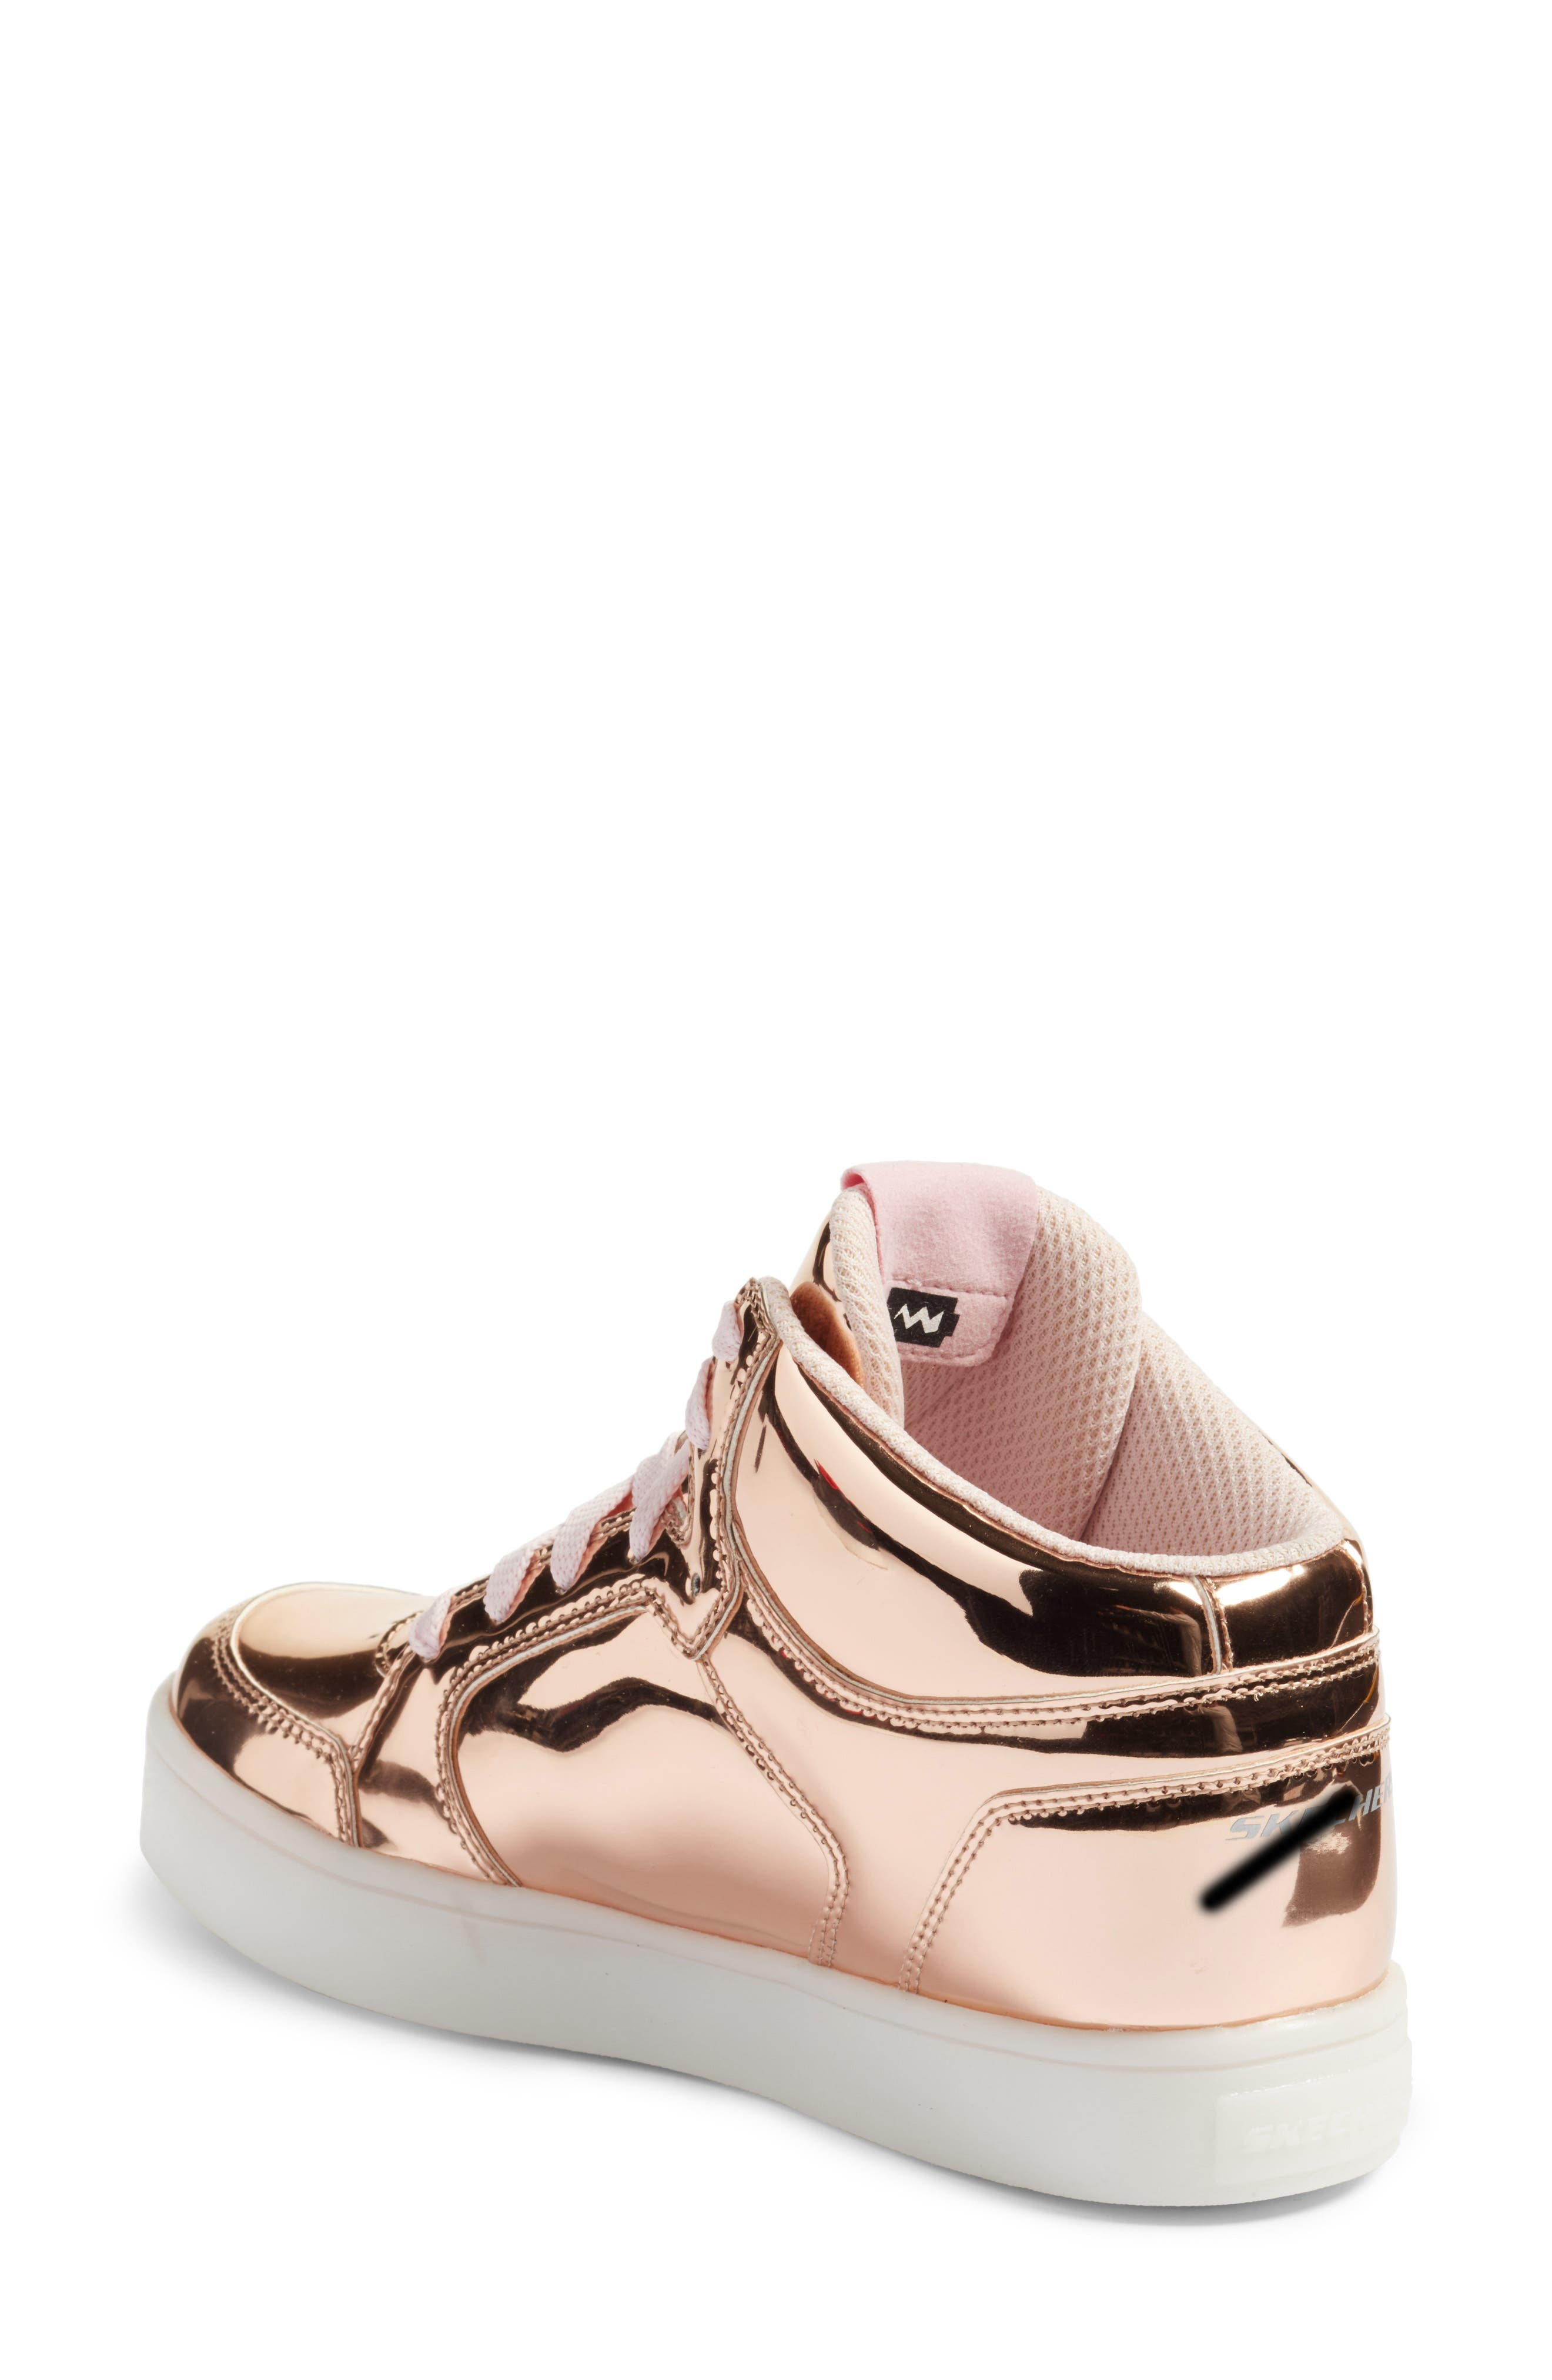 Energy Lights Metallic High Top Sneaker,                             Alternate thumbnail 7, color,